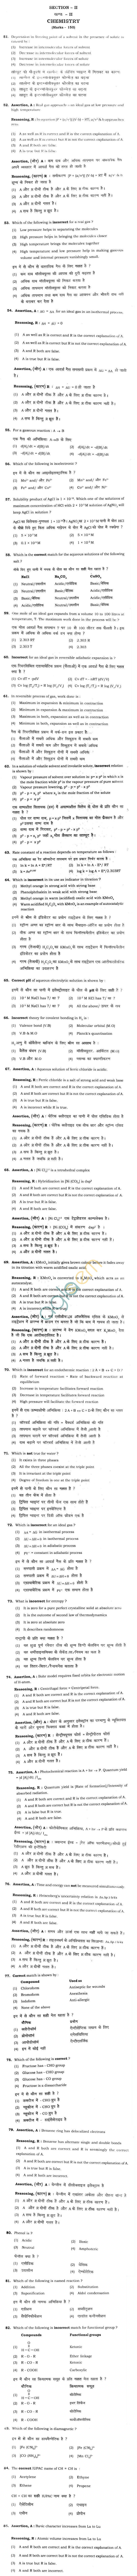 BHU UET 2013B.Sc. BiologyQuestion Paper